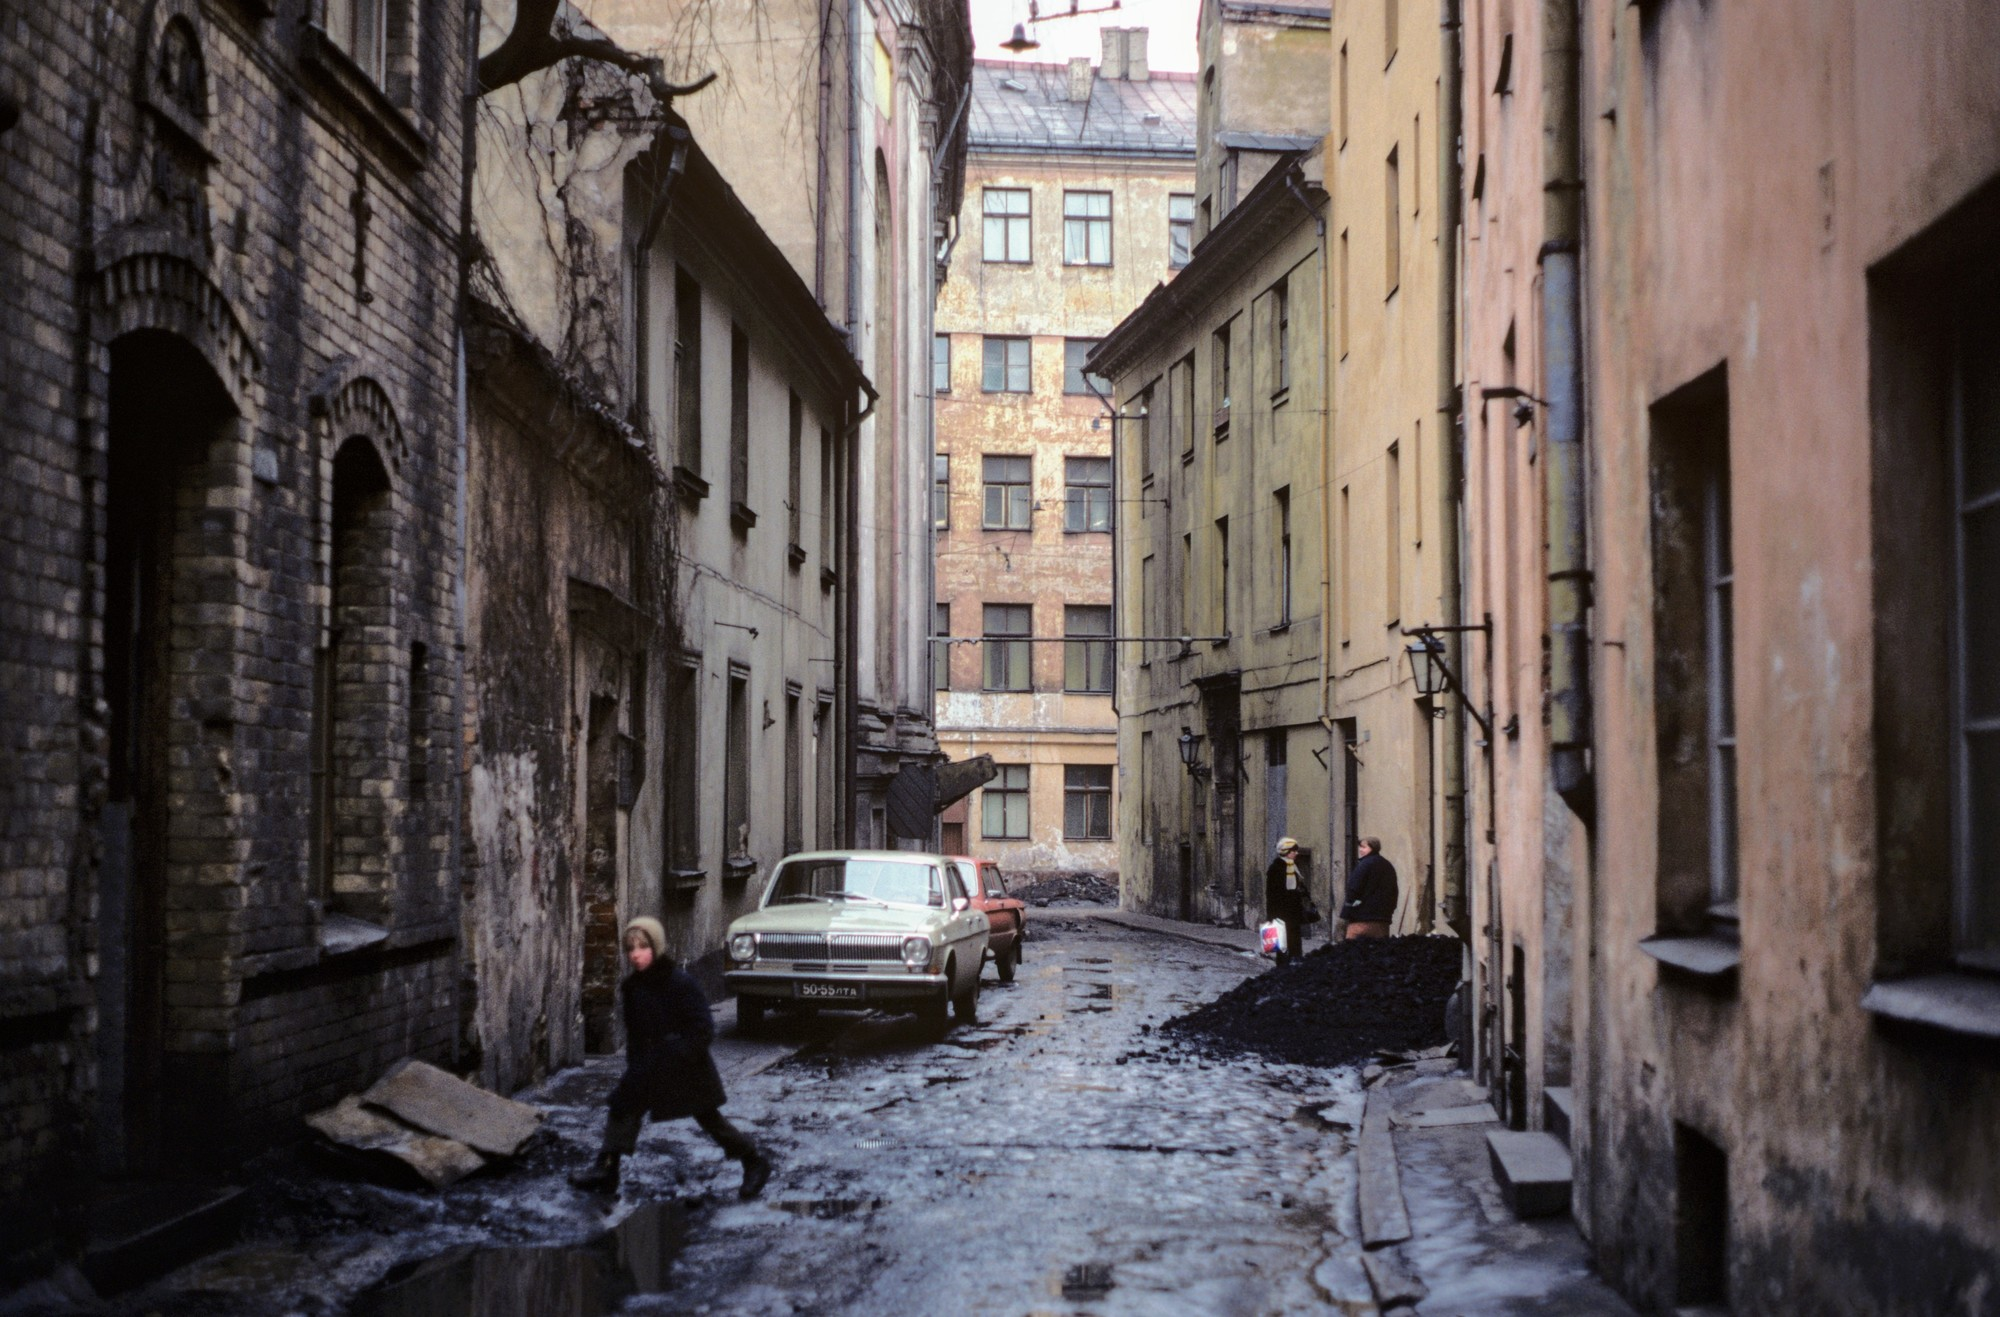 Ms2020_001_BurtonDoug_B1_F8_6_1979_Soviet_Union_022.jpg